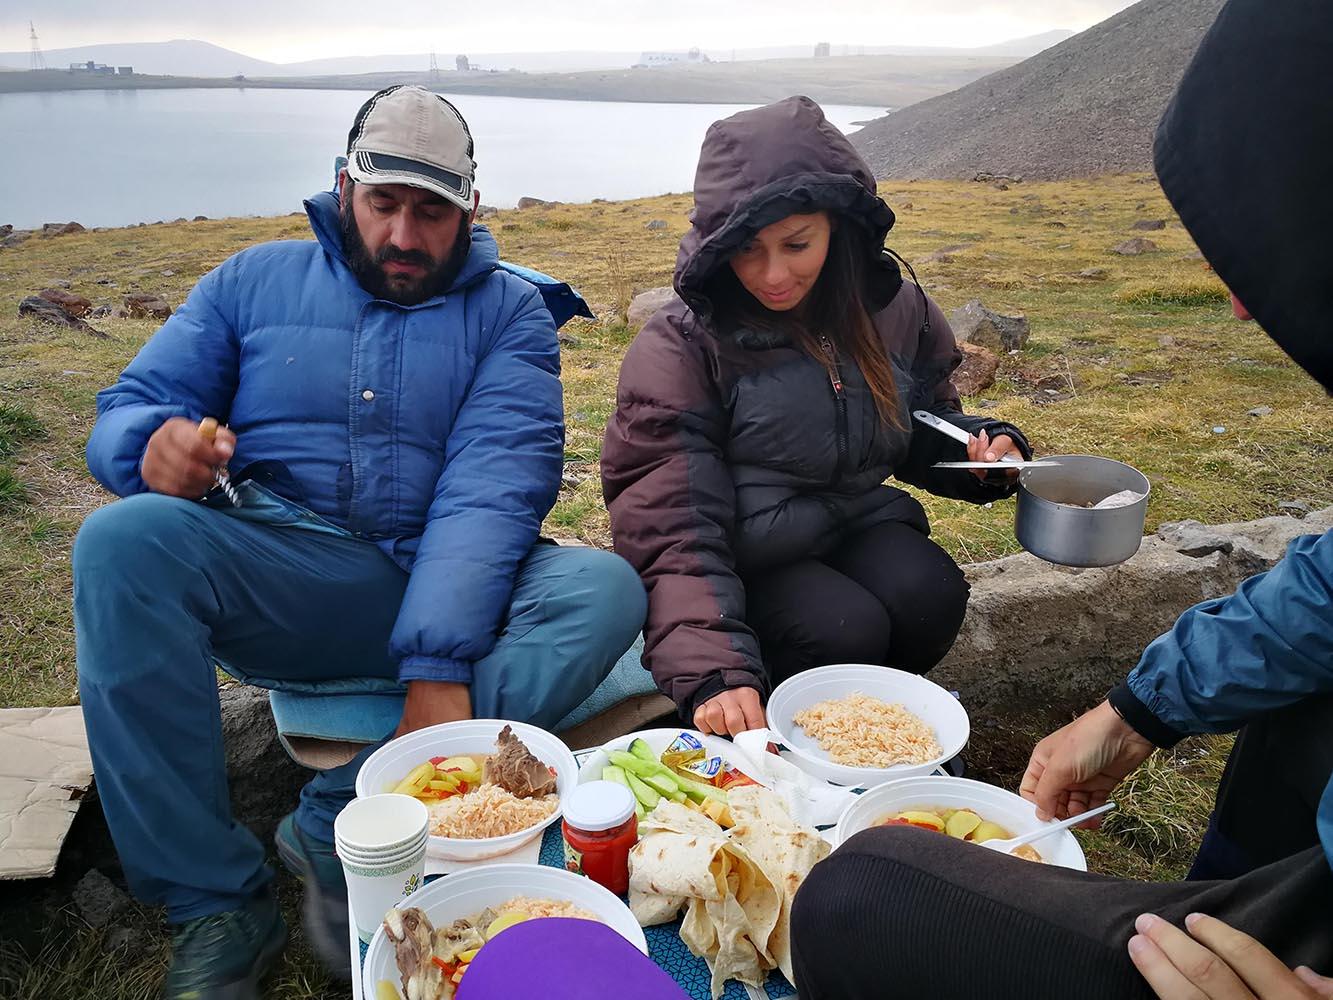 freecamping armenia